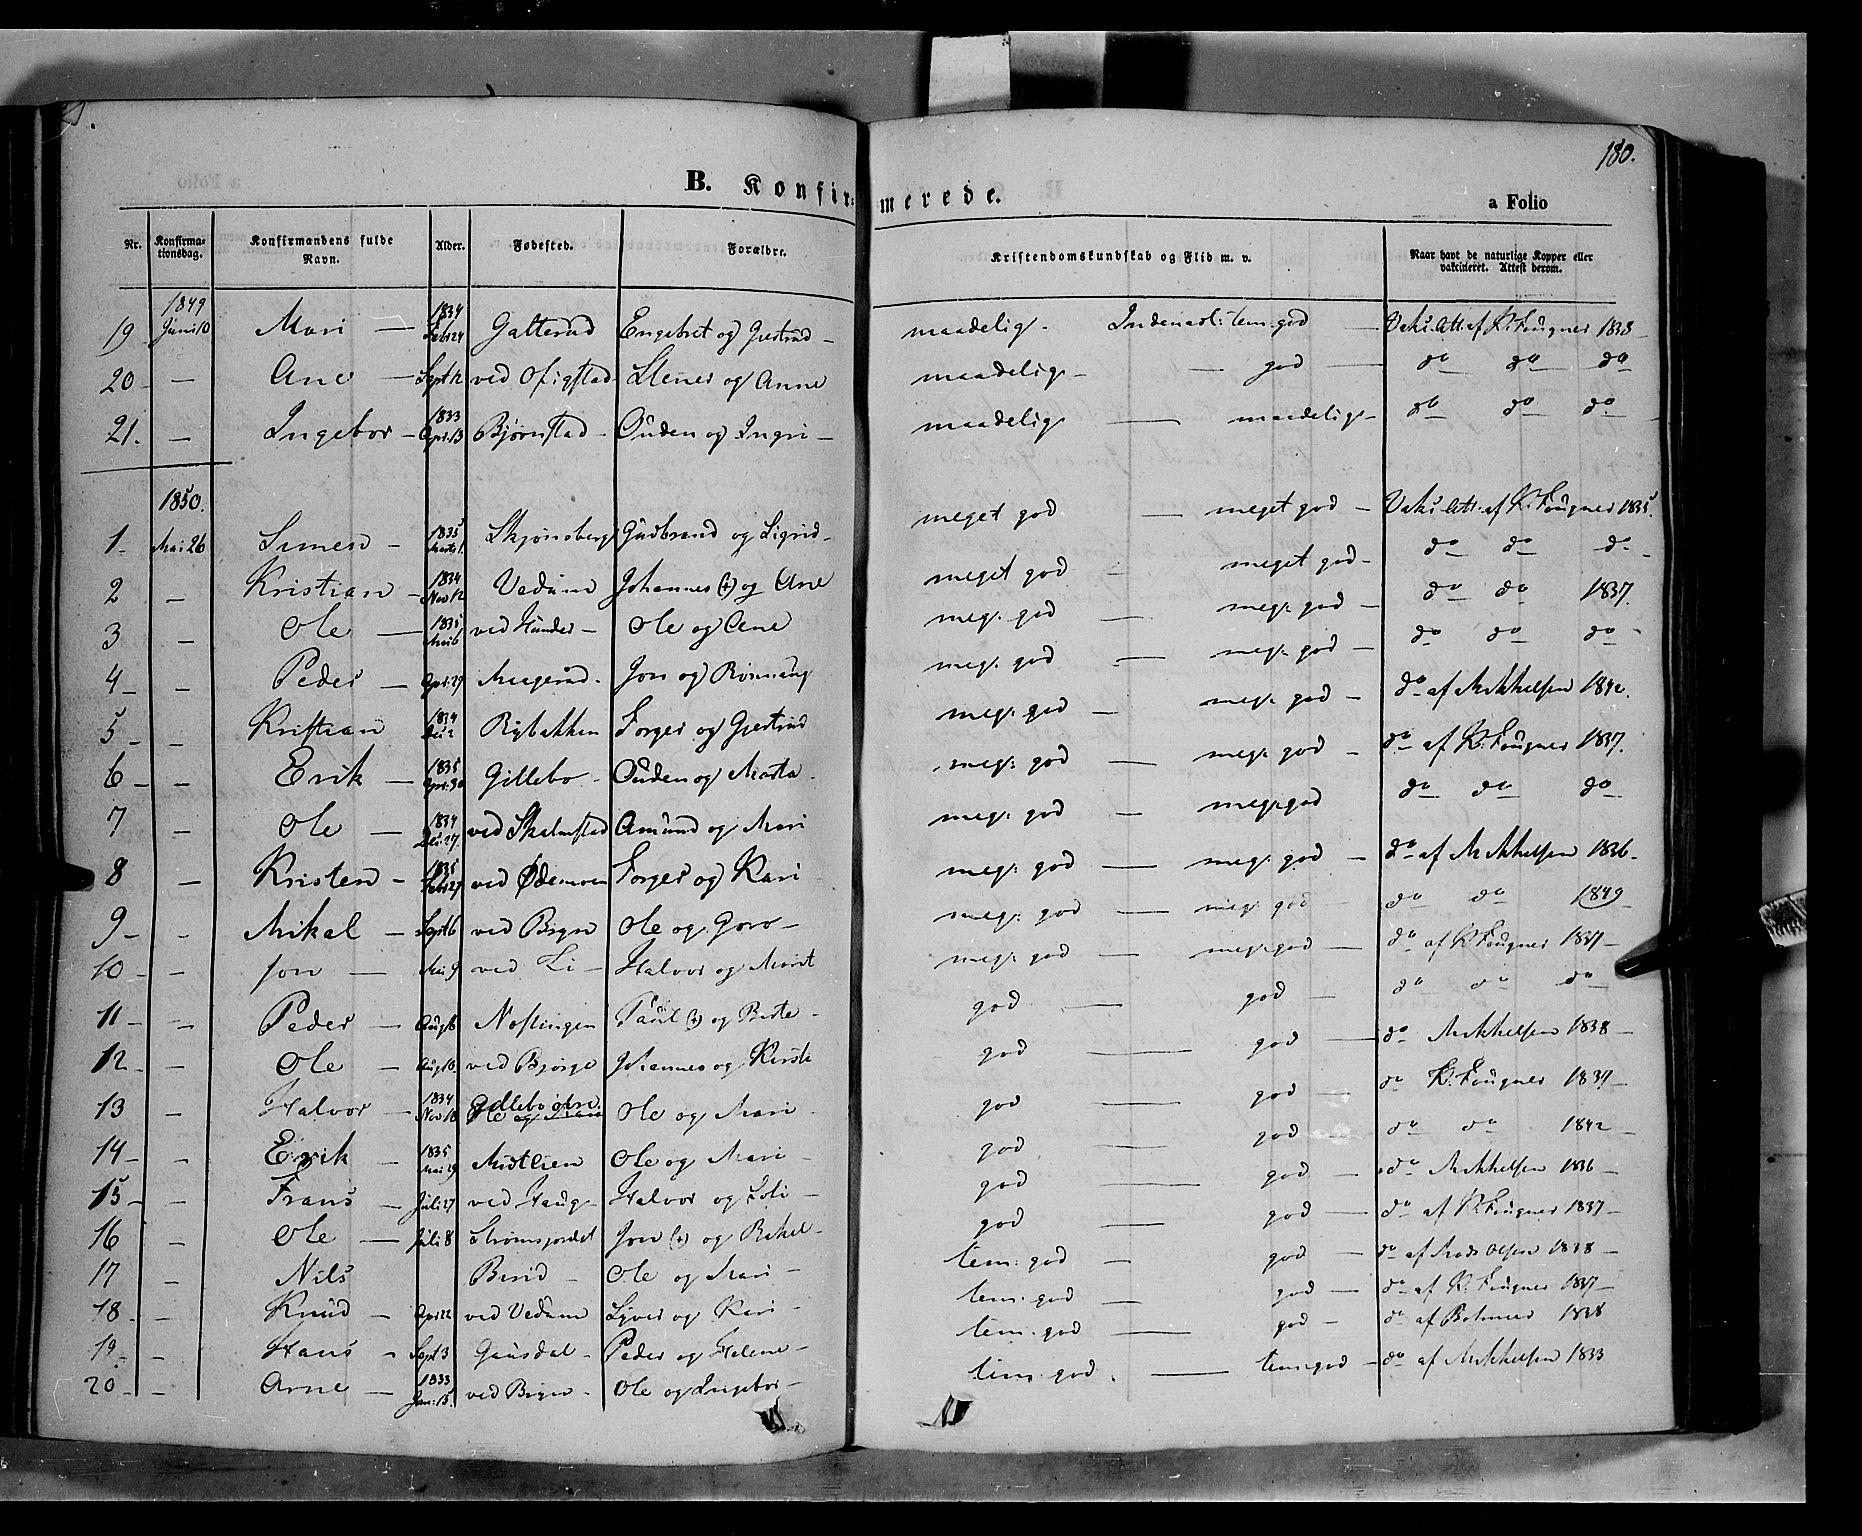 SAH, Øyer prestekontor, Ministerialbok nr. 5, 1842-1857, s. 180